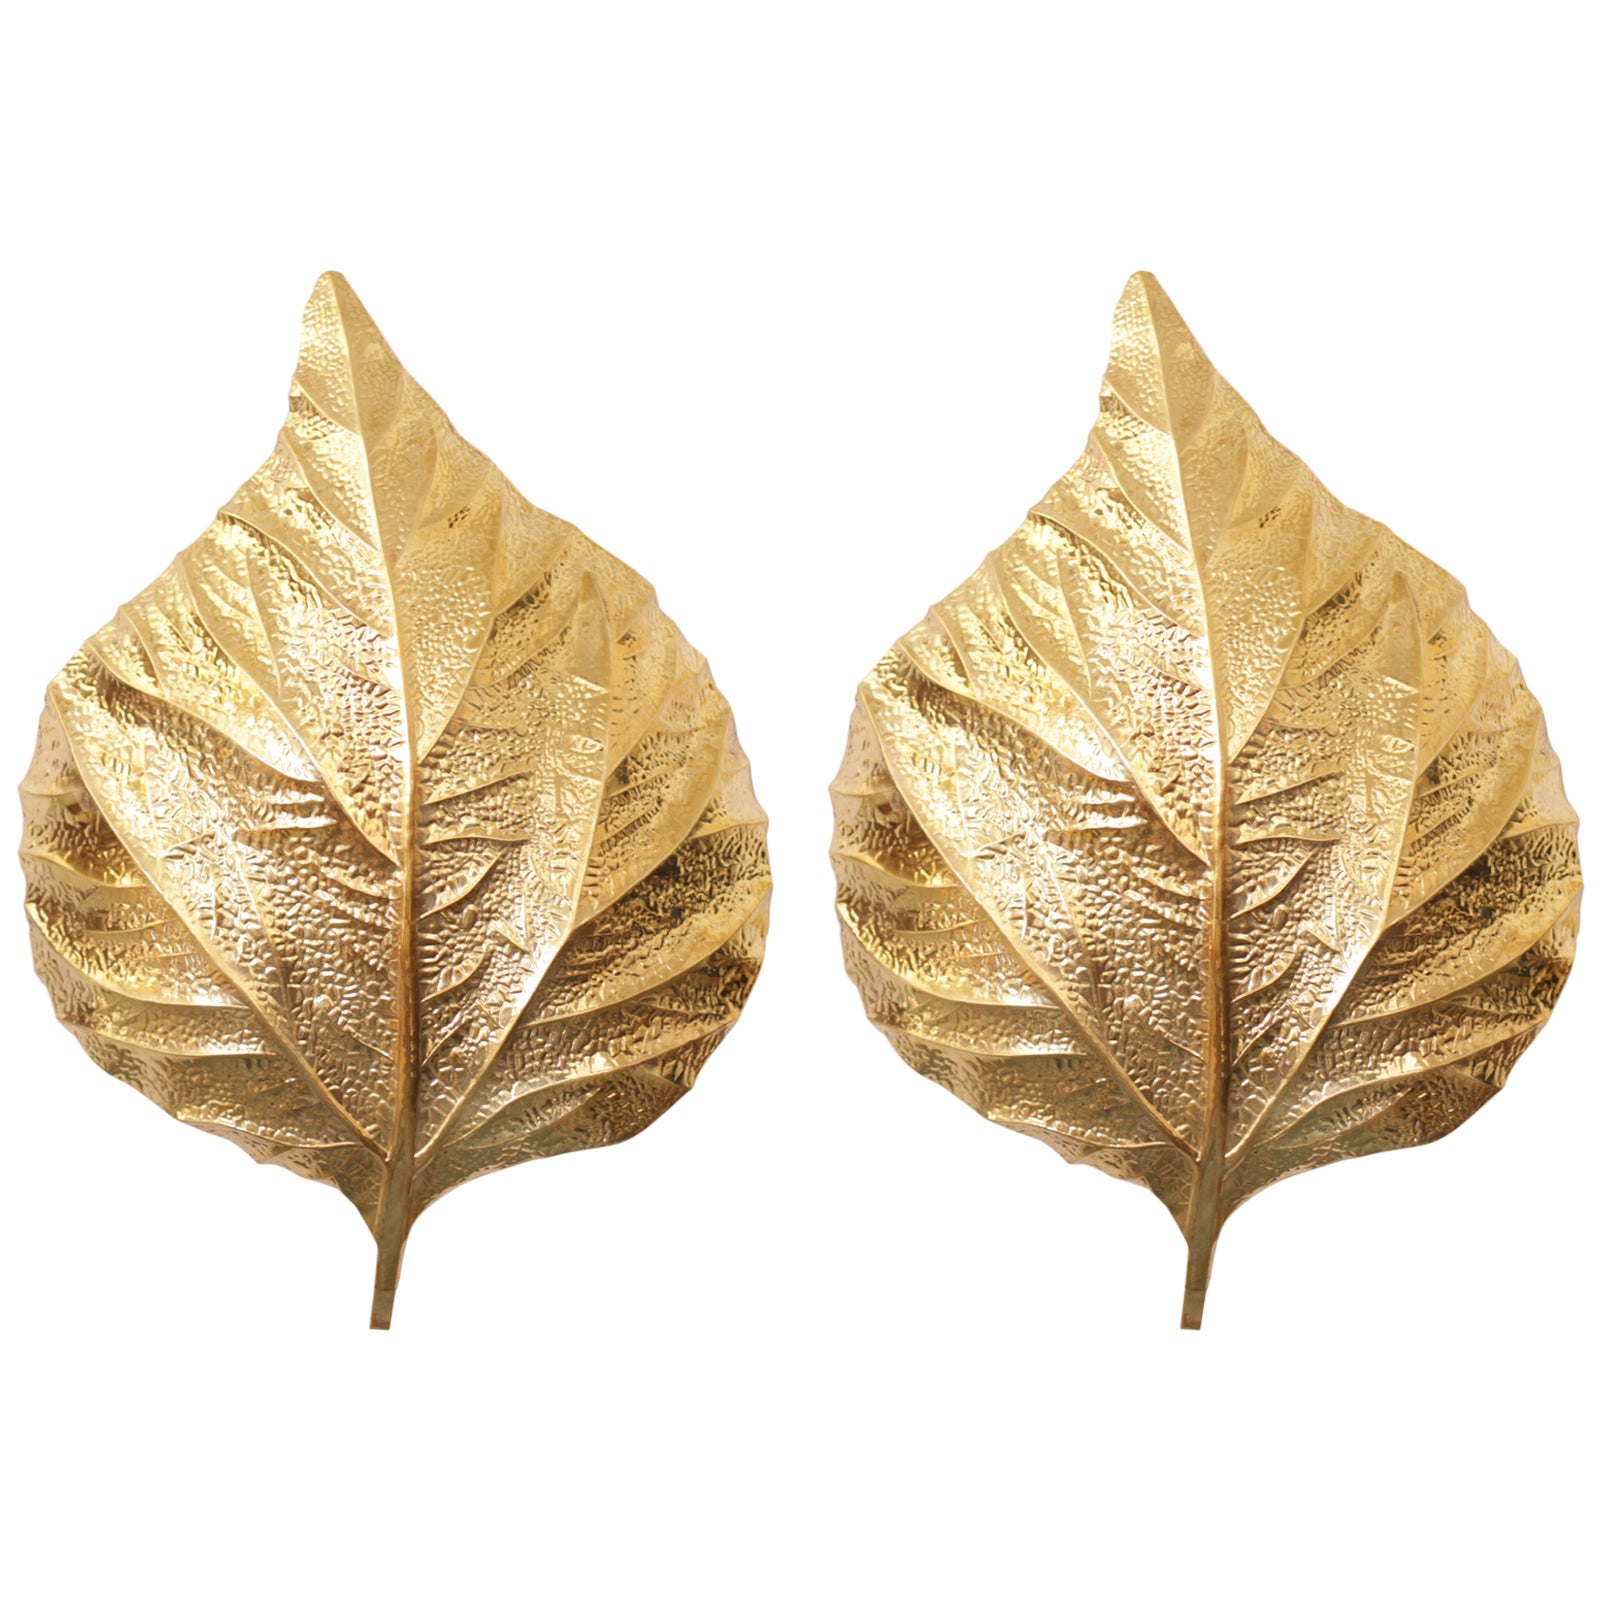 1 of 4 Huge Ginkgo Leaf Brass Wall Lights or Sconces by Tommaso ...